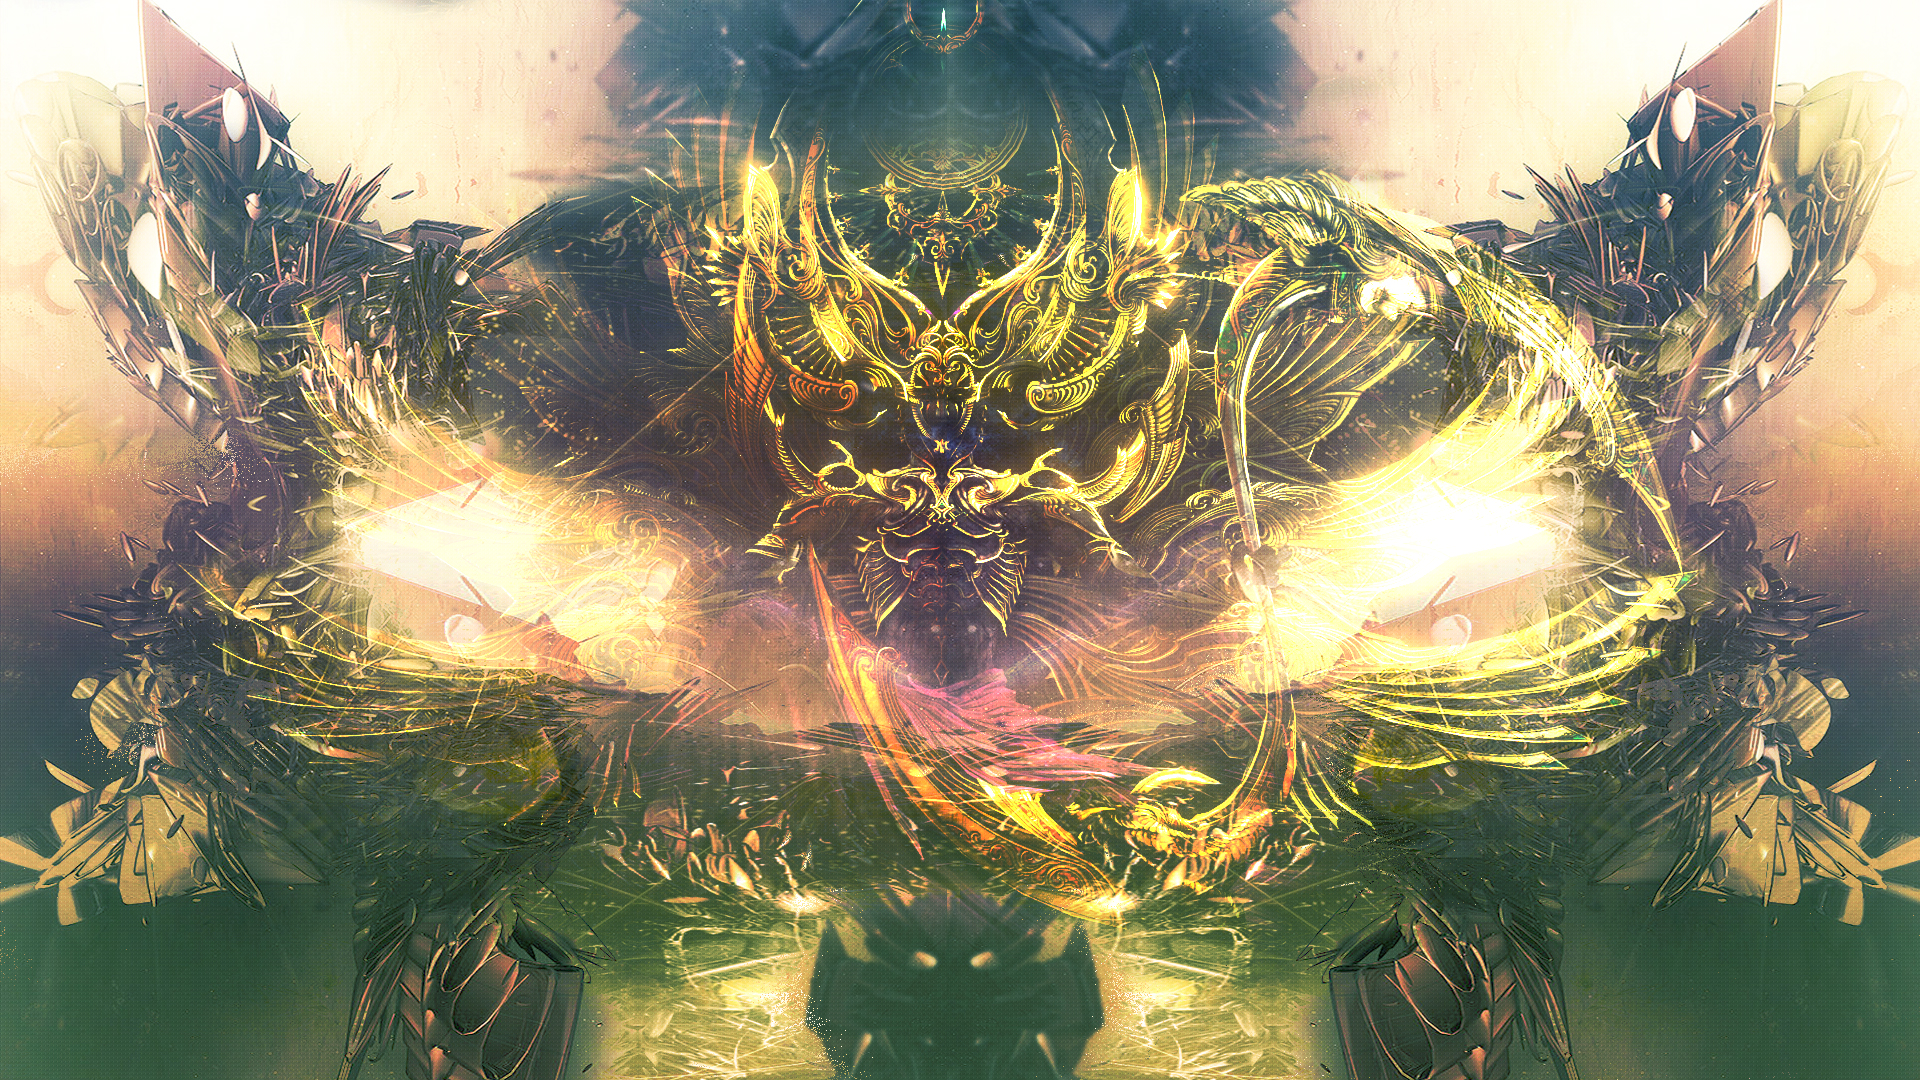 Final Fantasy Bhunivelze God Of Light Ps Art V2 By Xionss On Deviantart